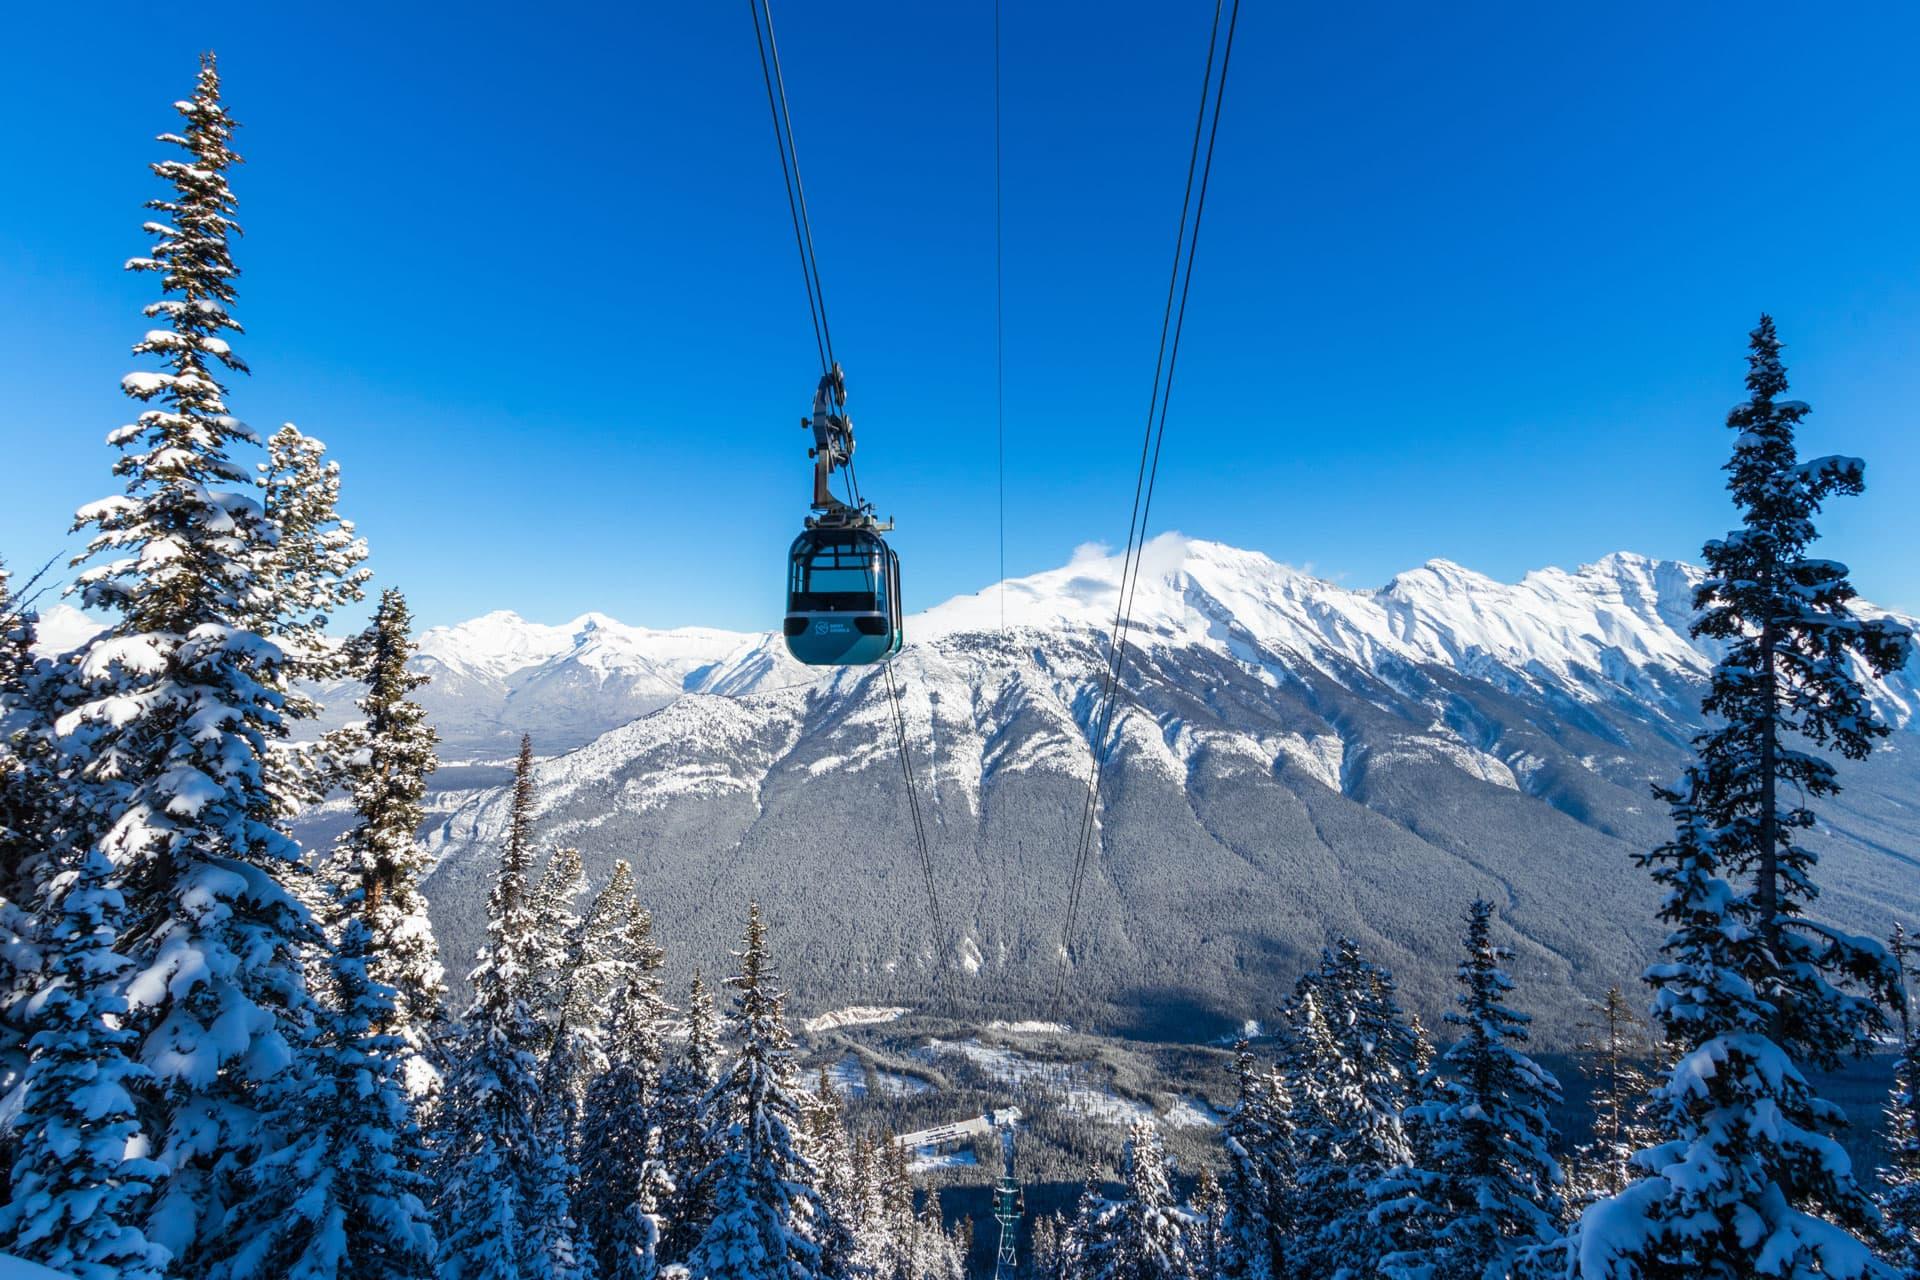 The Banff Gondola